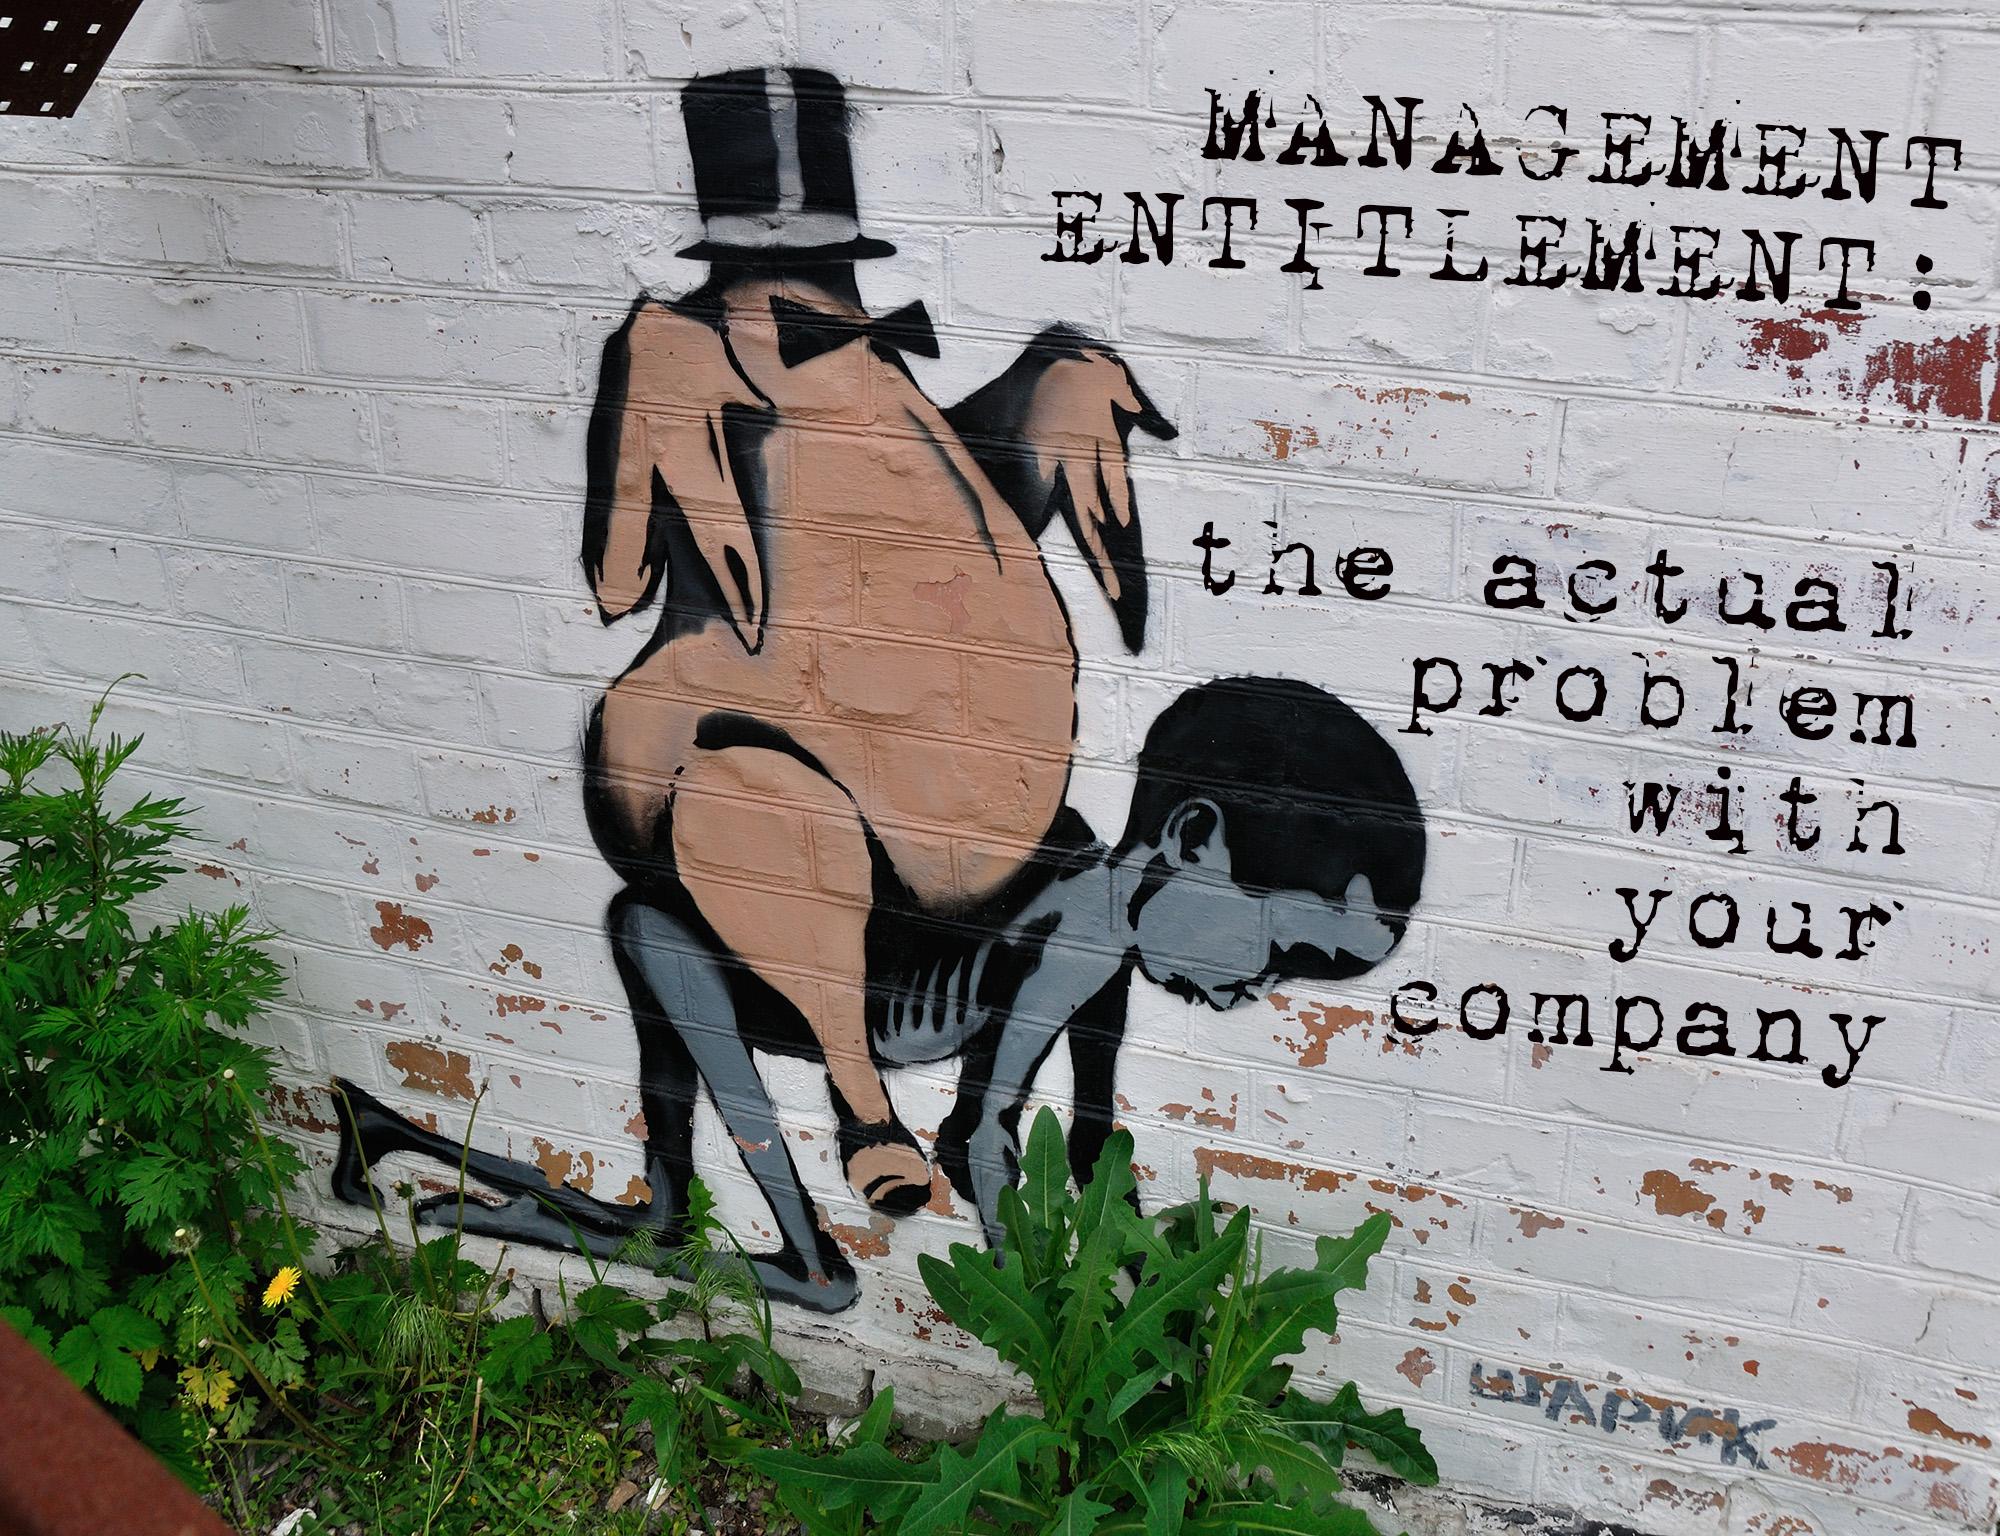 management-entitlement-the-actual-problem-at-your-company